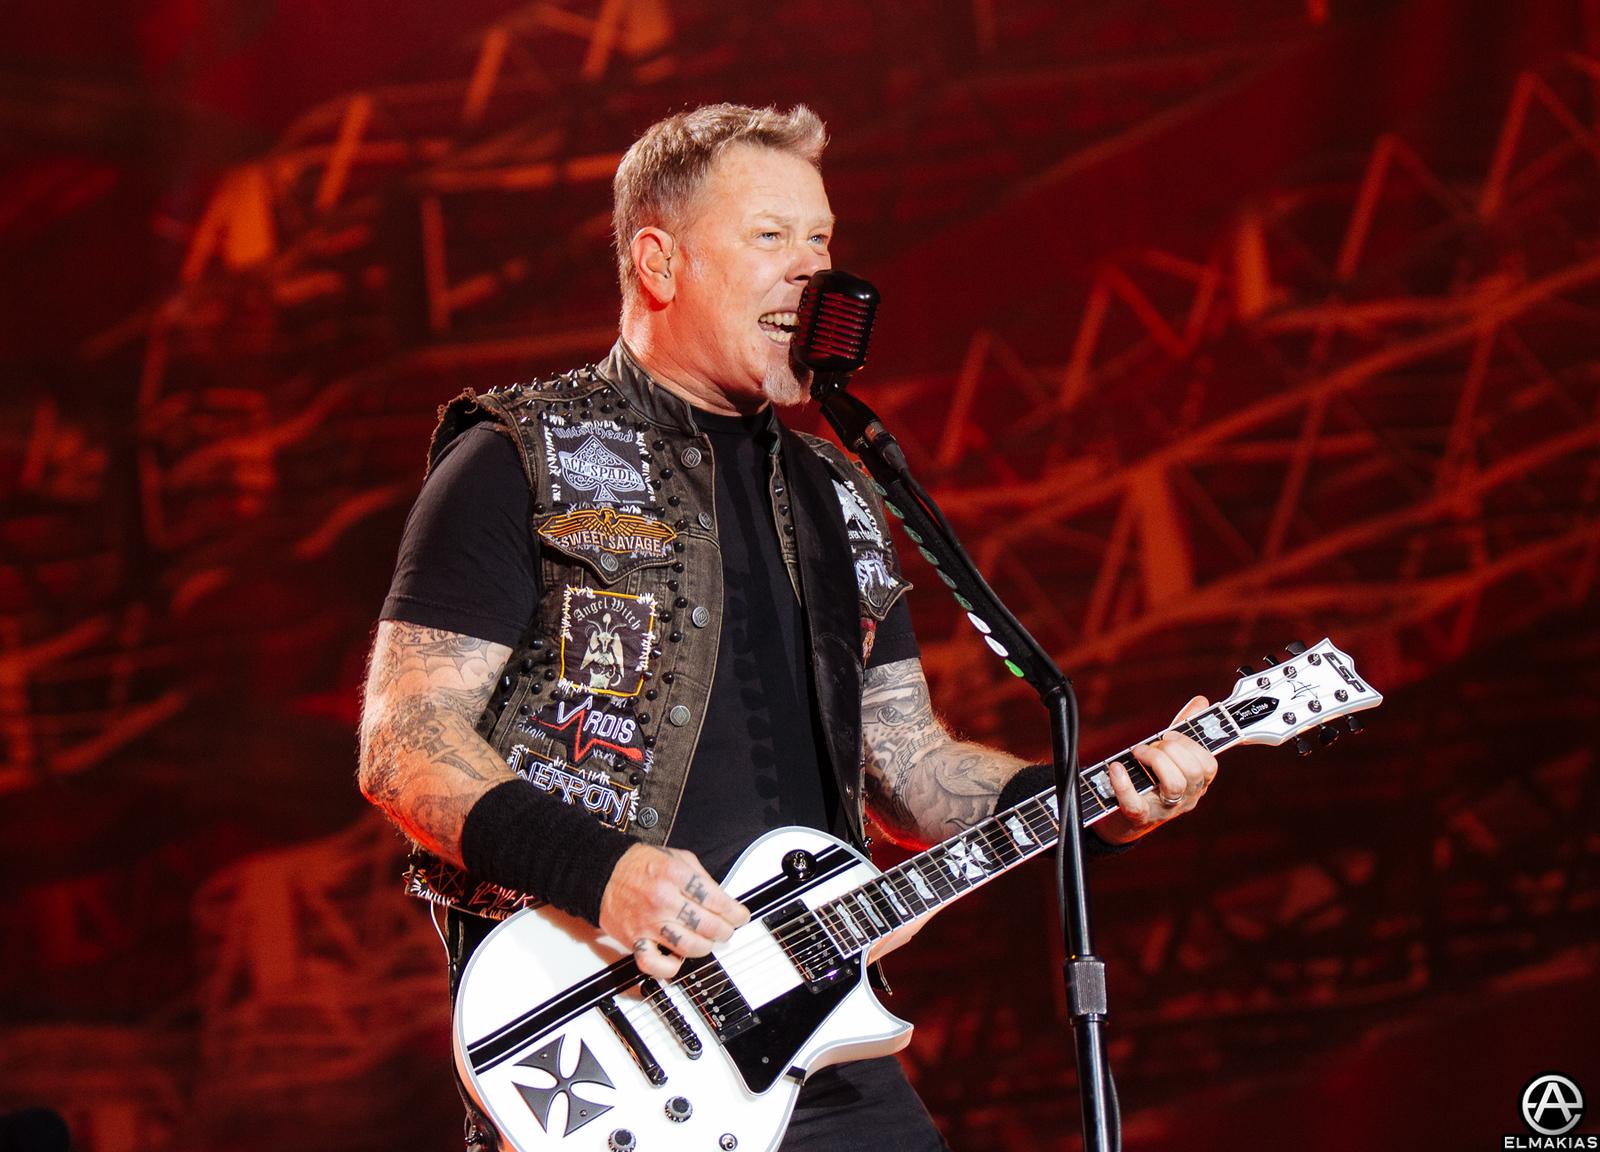 James Hetfield of Metallica at Rock in Vienna - European Festivals